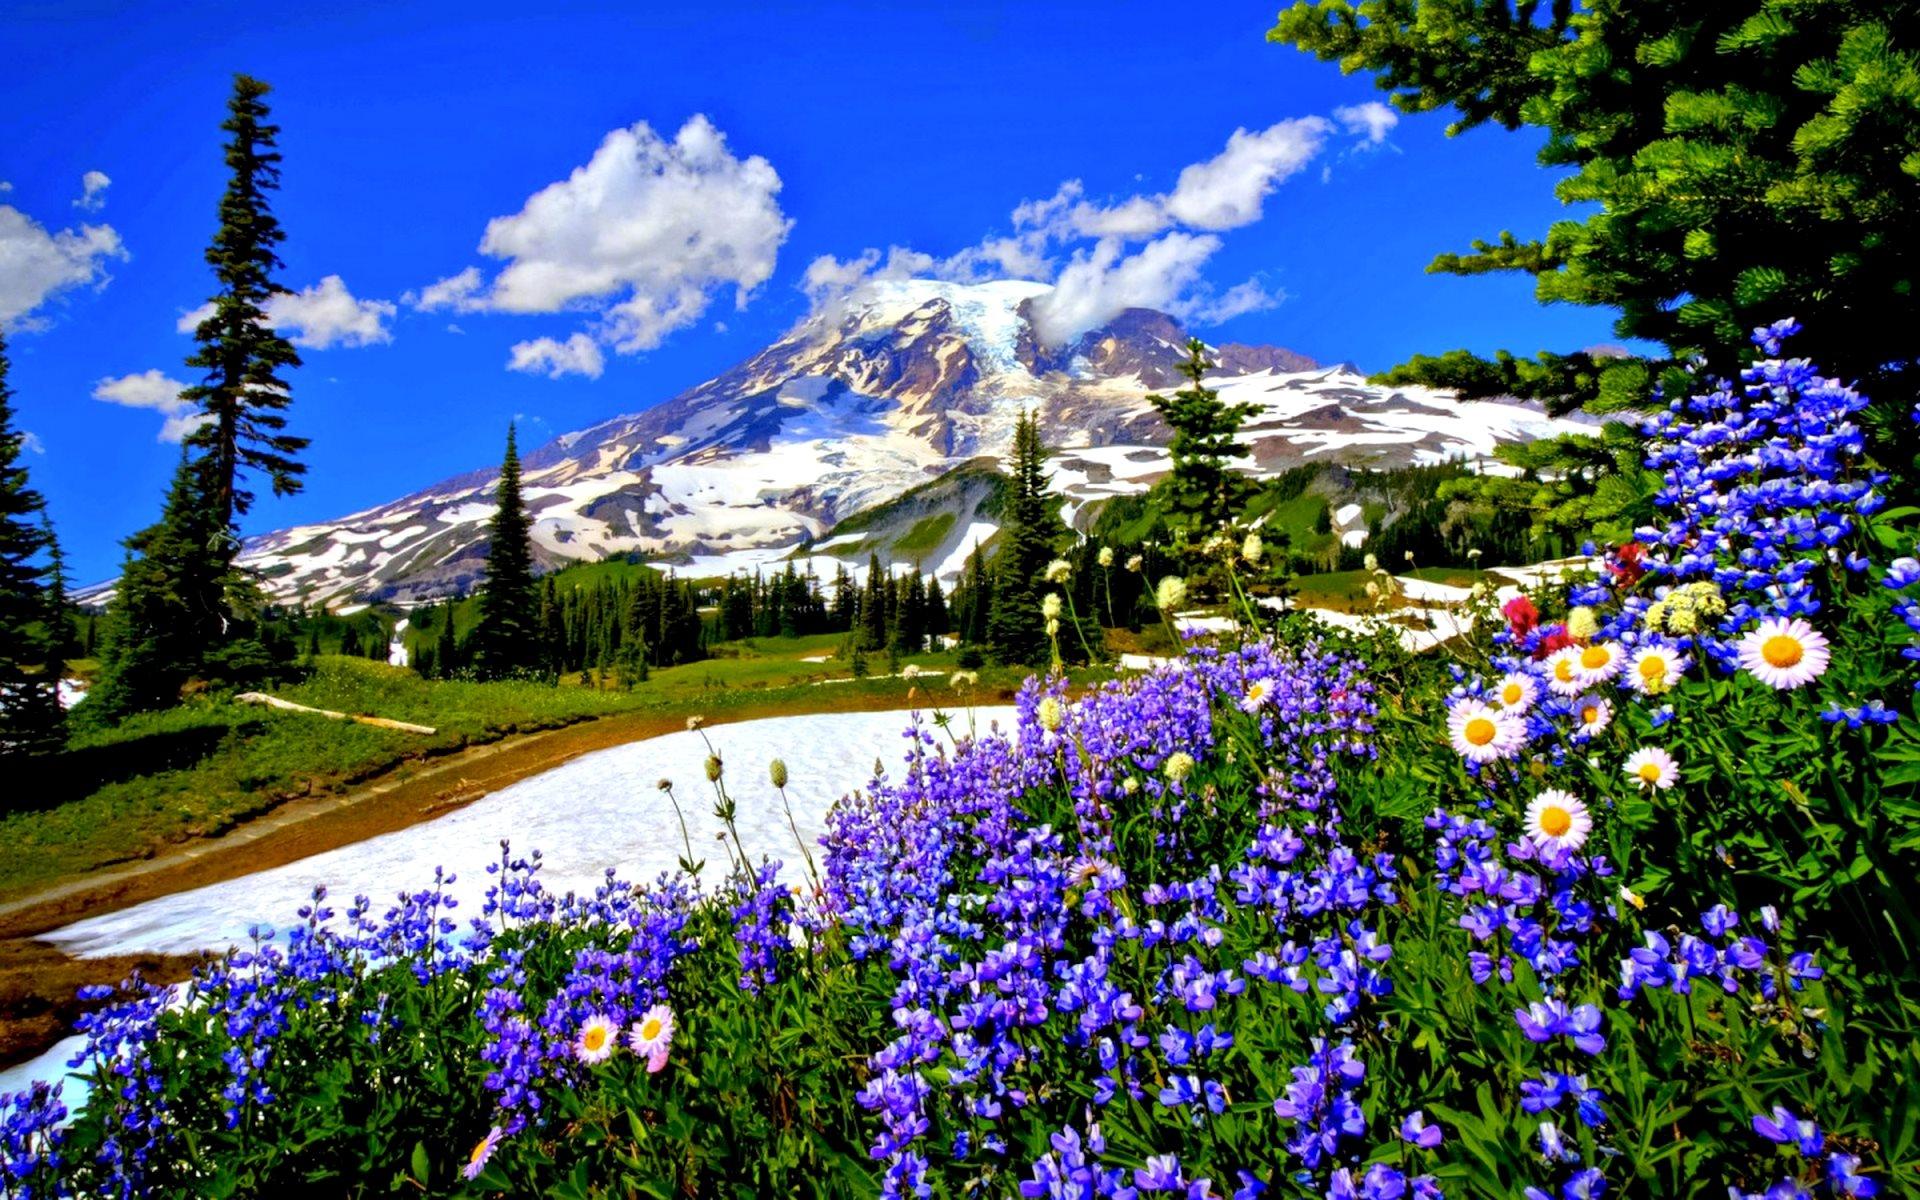 Great Wallpaper Mountain Spring - Spring-Mountains-Wallpaper-1920x1200  Graphic_491371.jpg